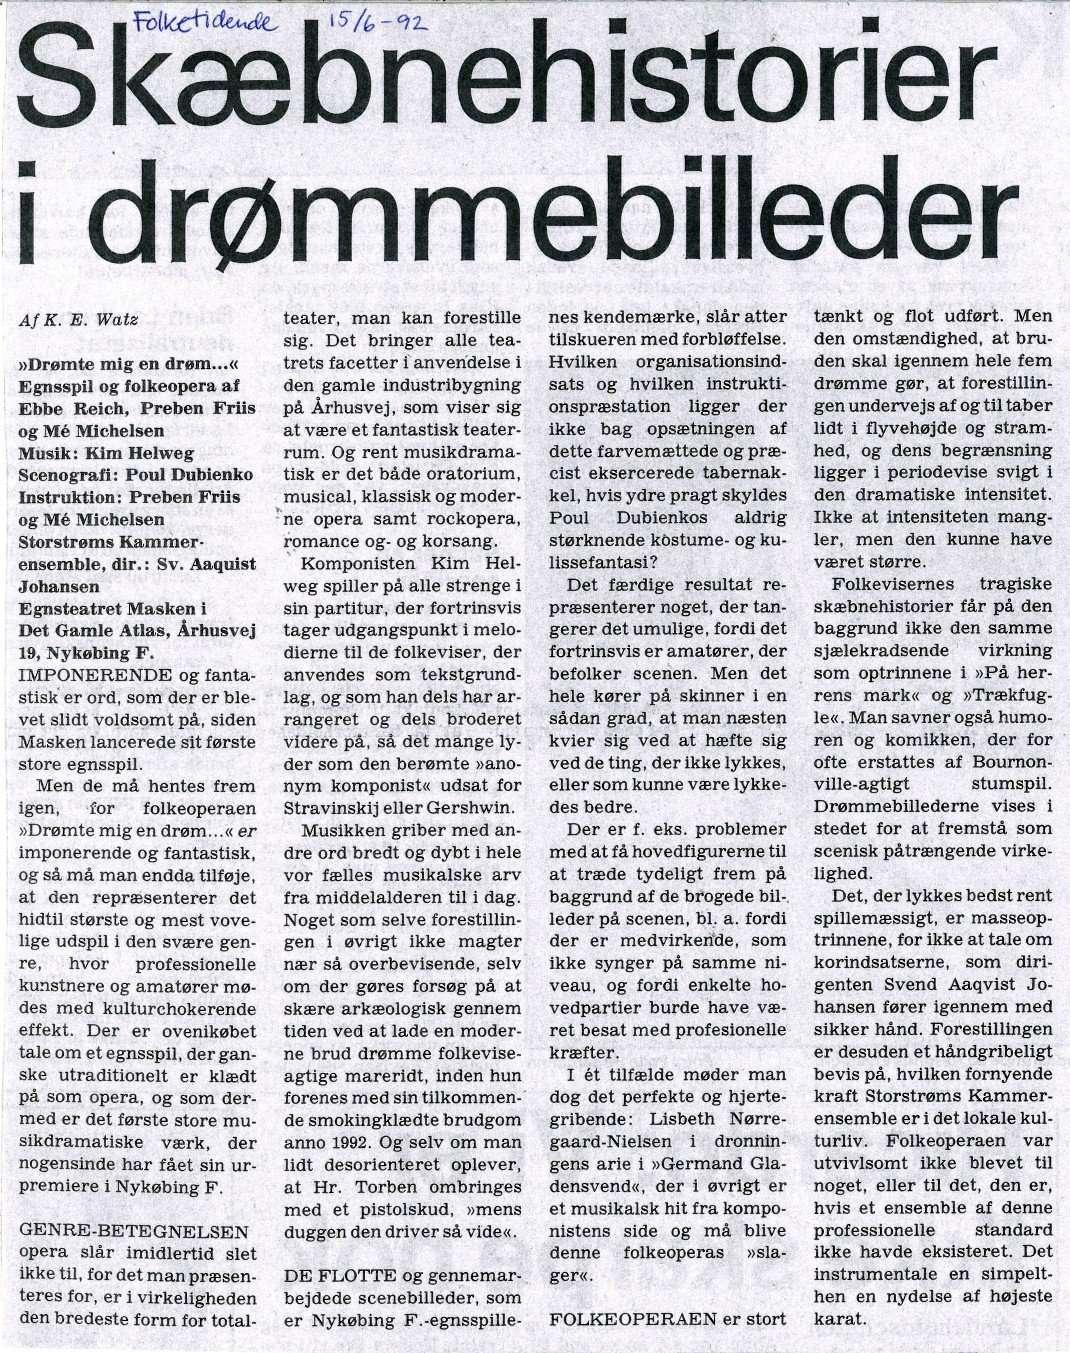 1992 Drømte mig en drøm artikel